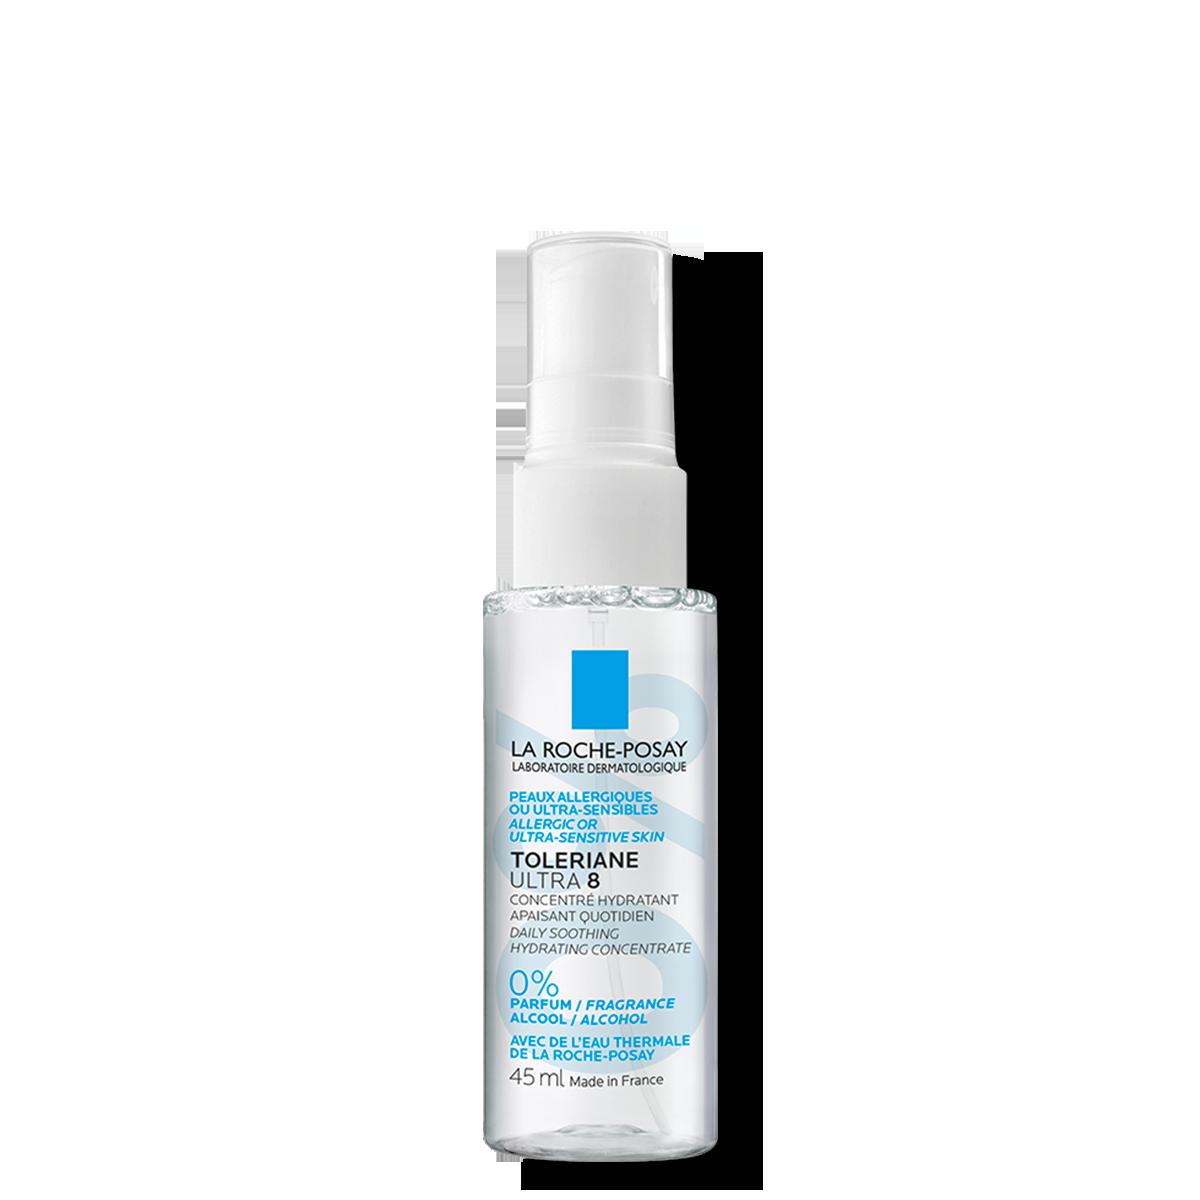 La Roche Posay ProduktSide Toleriane Ultra 8 40ml 33378756177 Foran